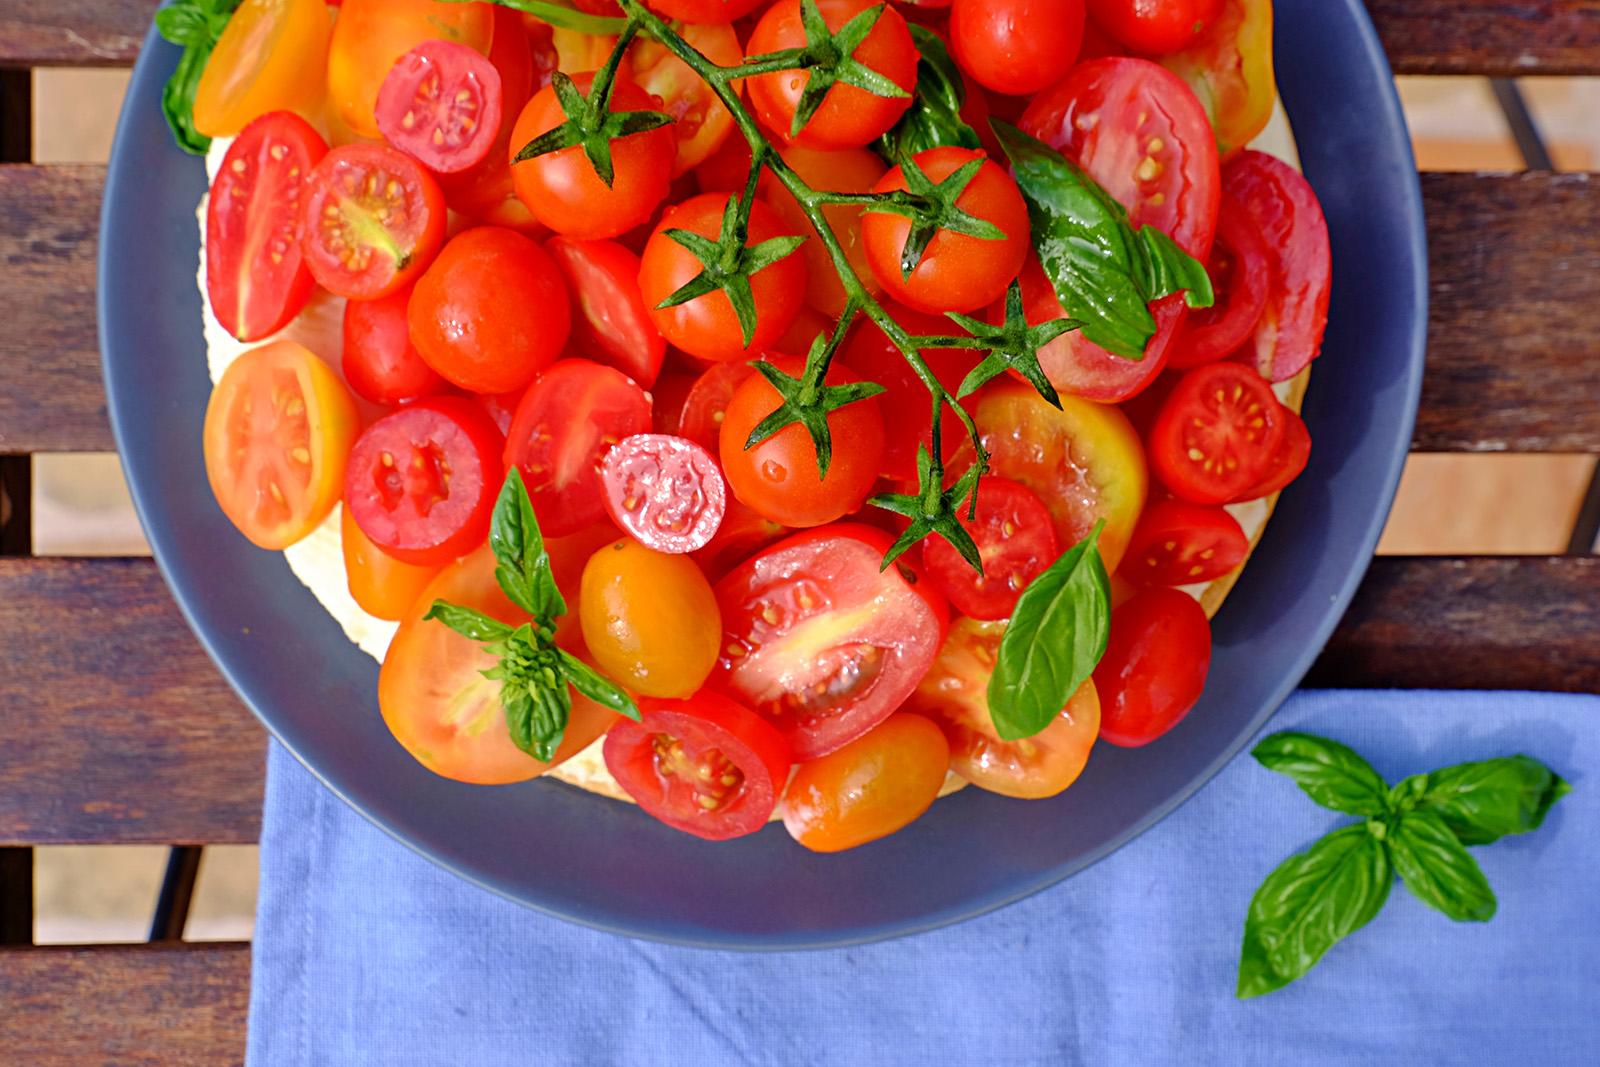 Cherry rajčata na stonku ponechejte na ozdobu